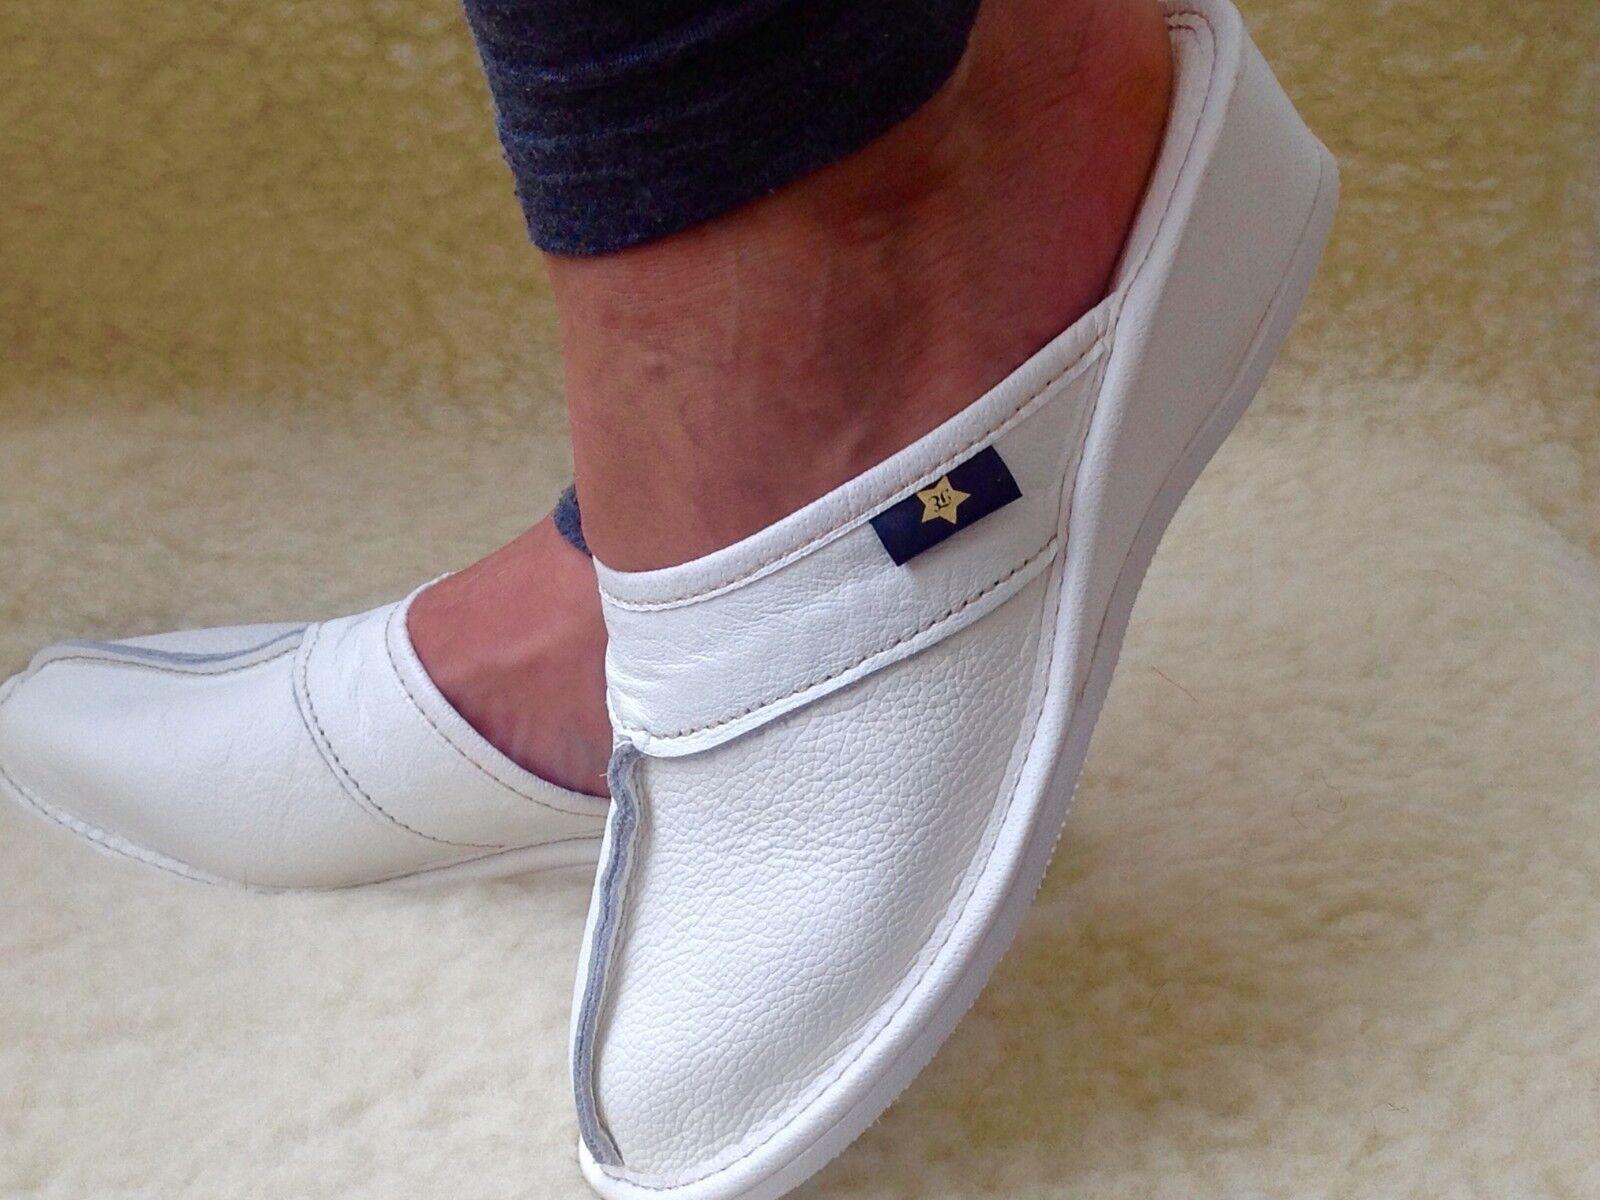 New Women Nurse White Slippers Wooden Flip Flop Leather Slippers White Wedge Garden Home decor 3944cf